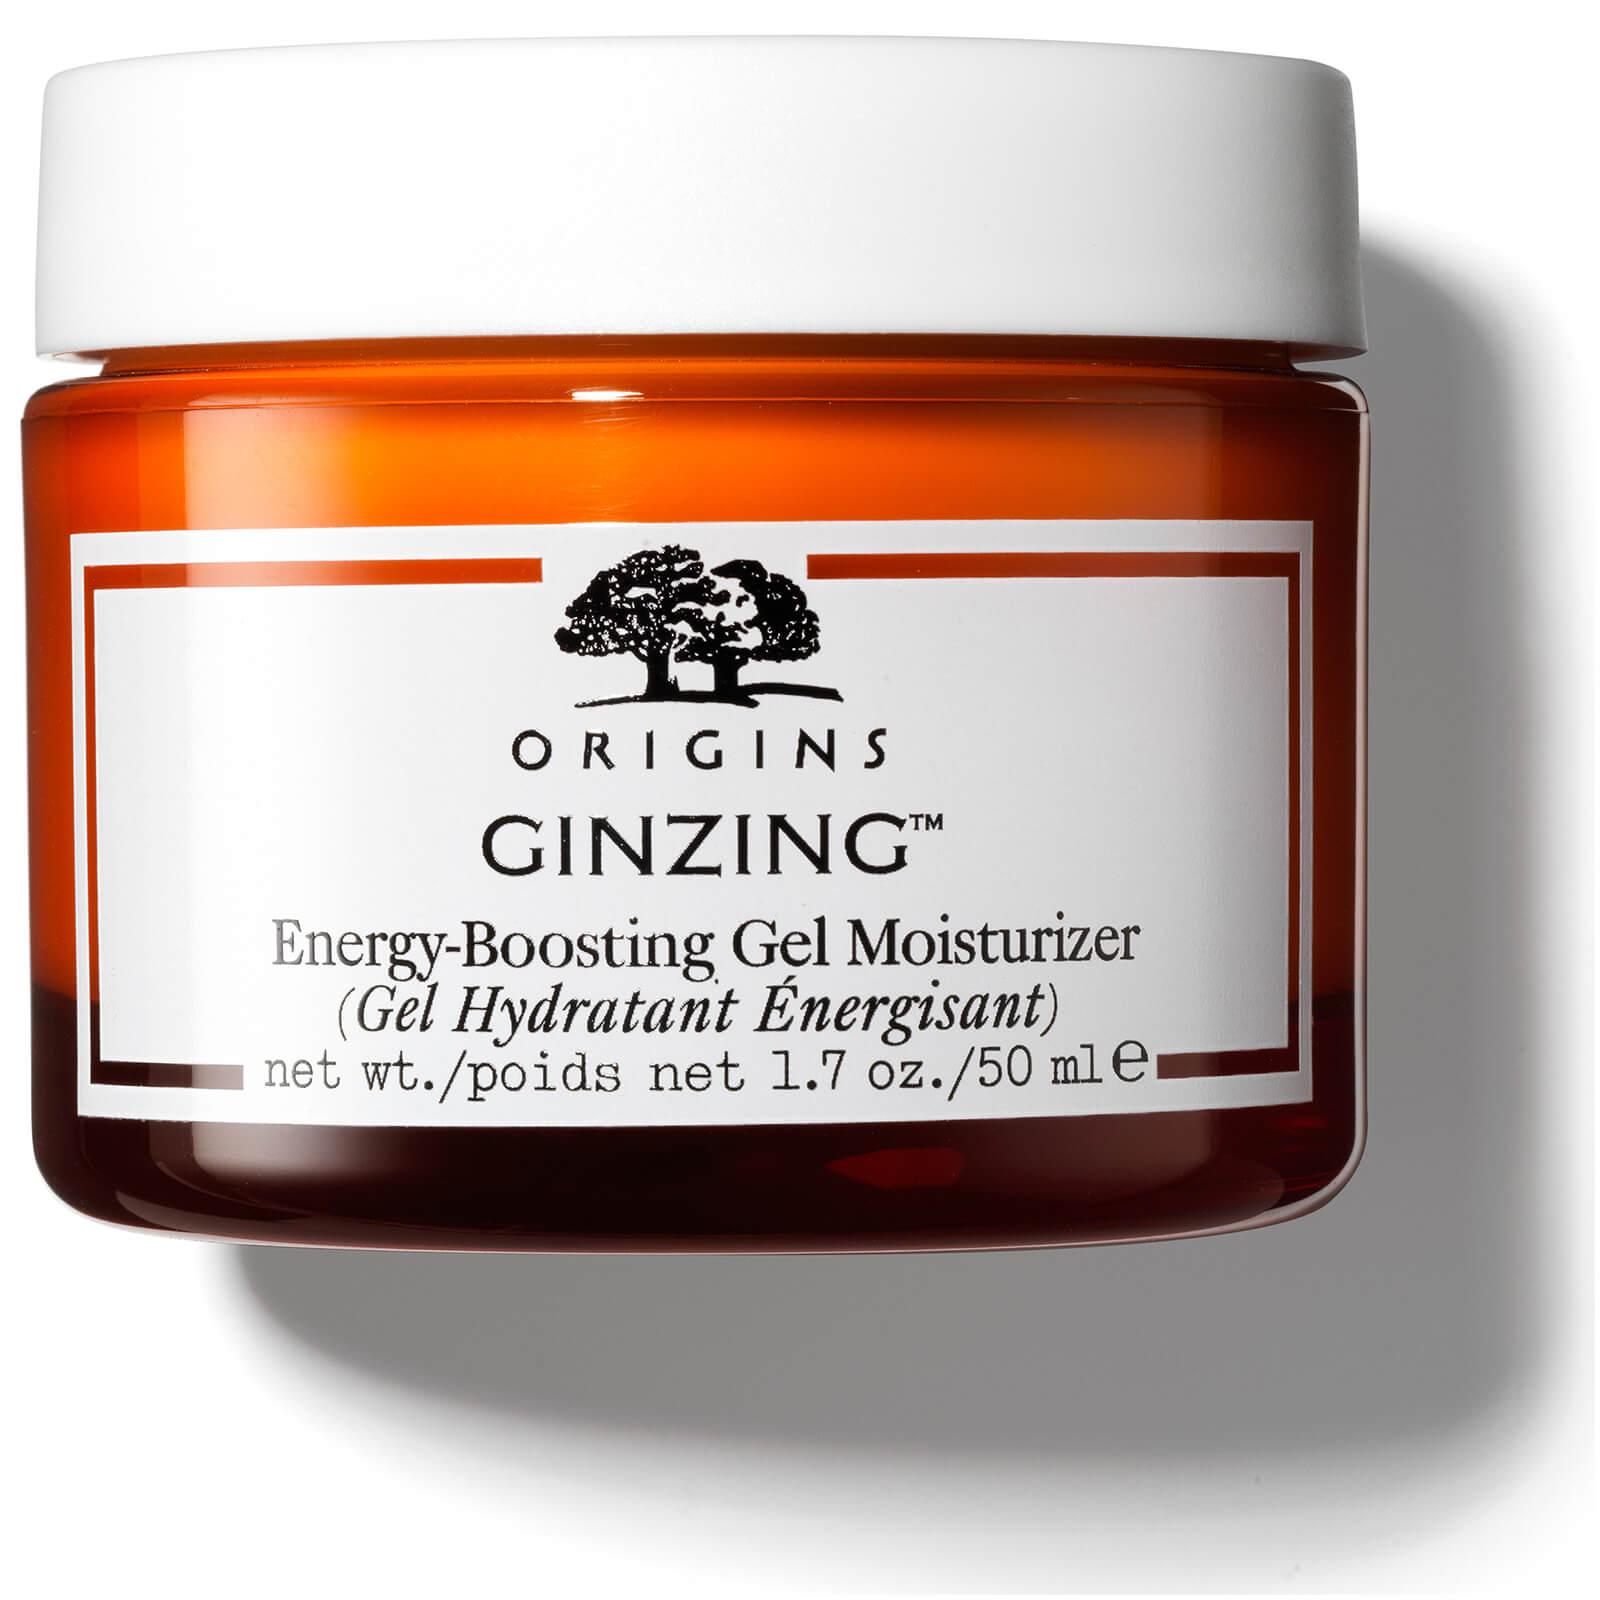 origins ginzing